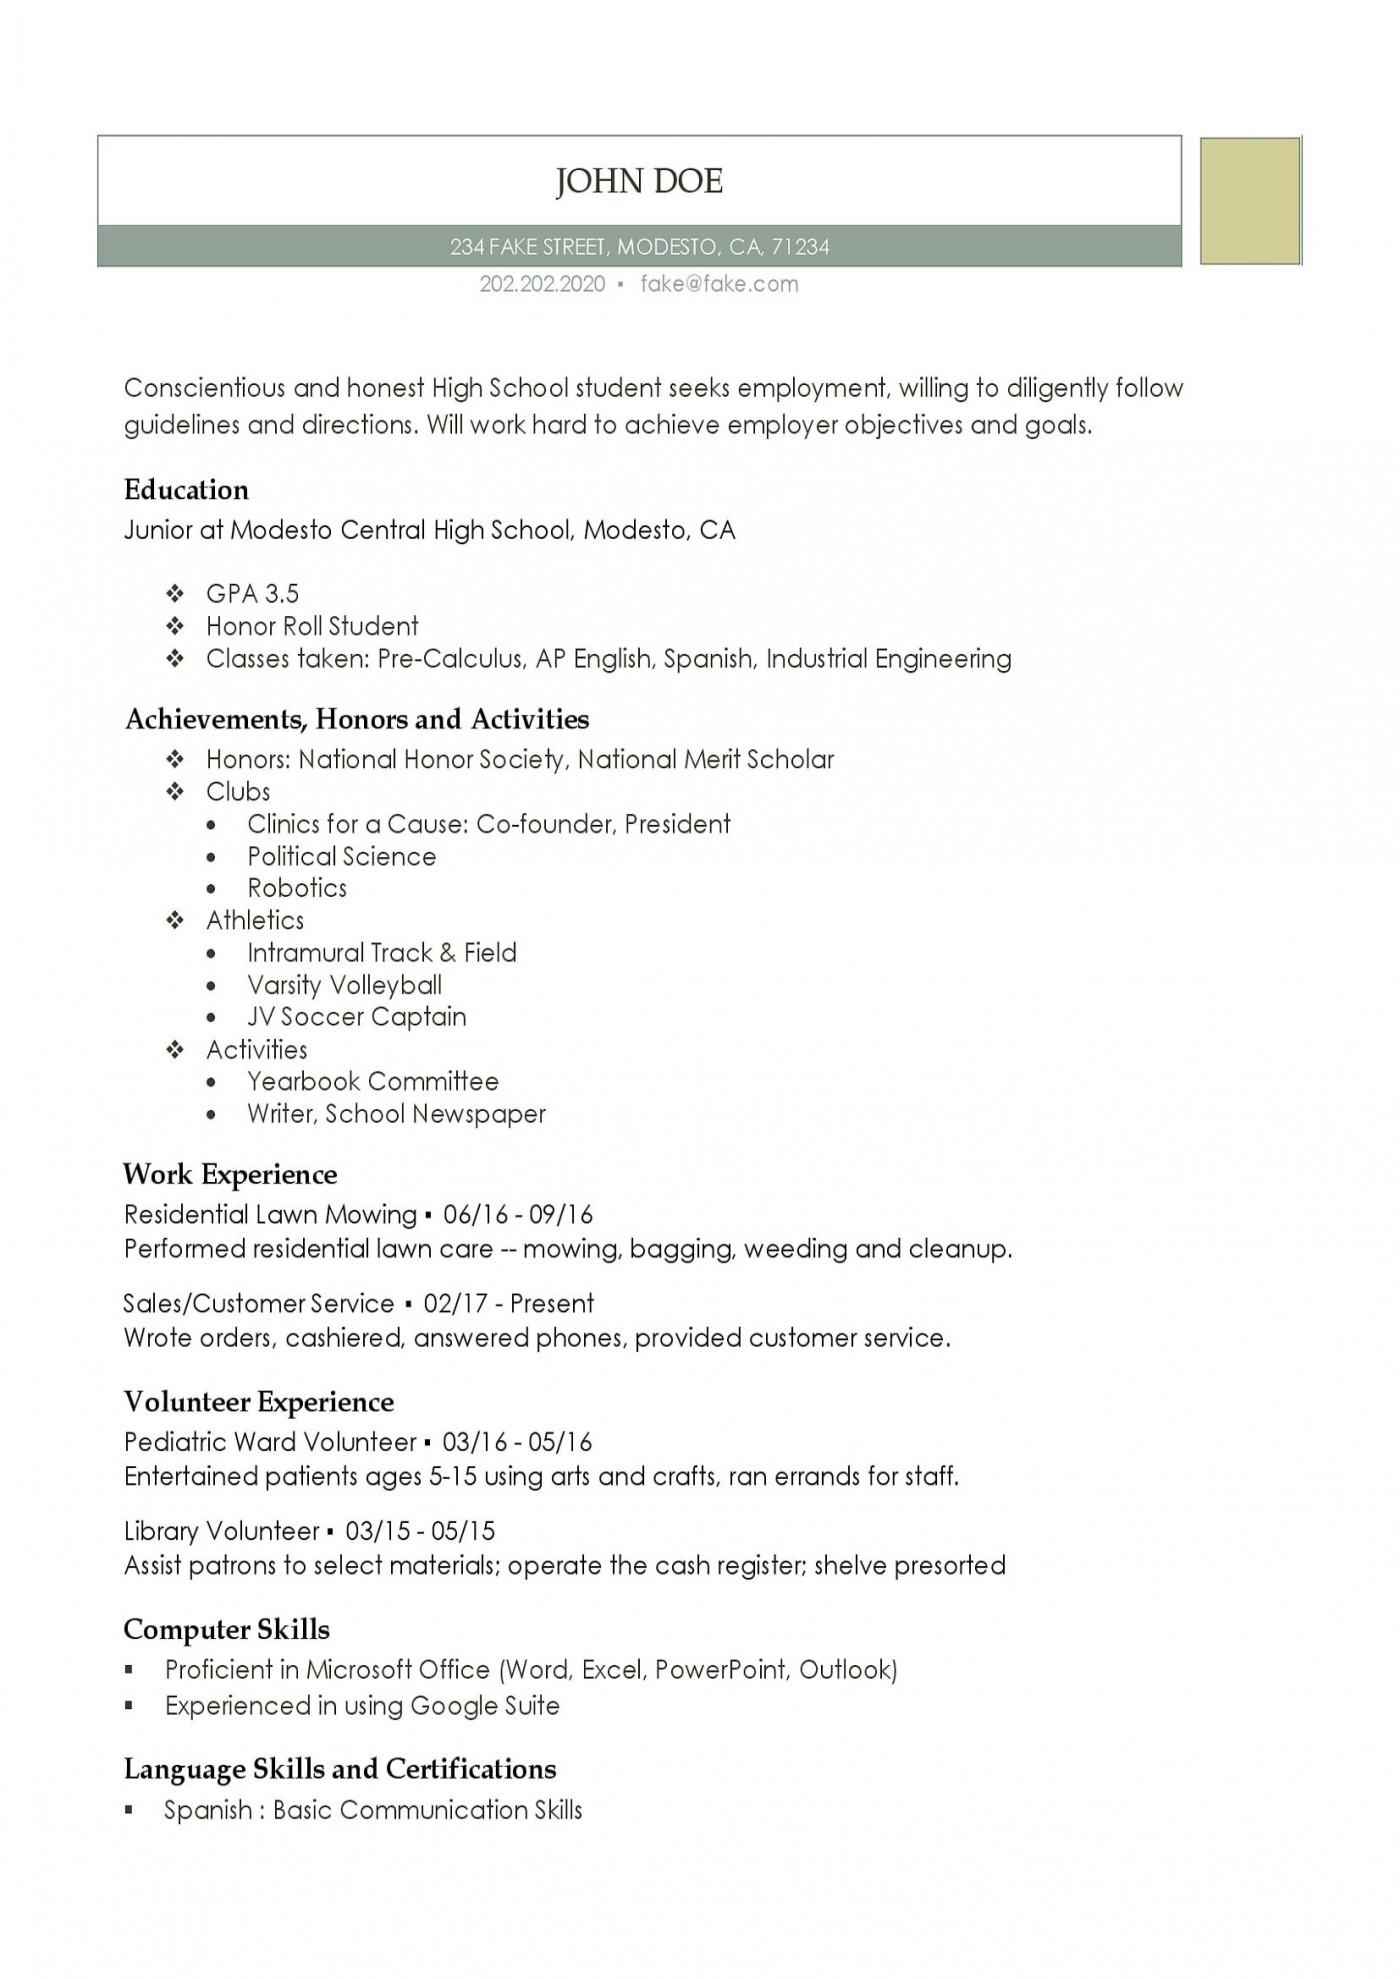 001 Fantastic High School Student Resume Template Resolution  Free Google Doc1400